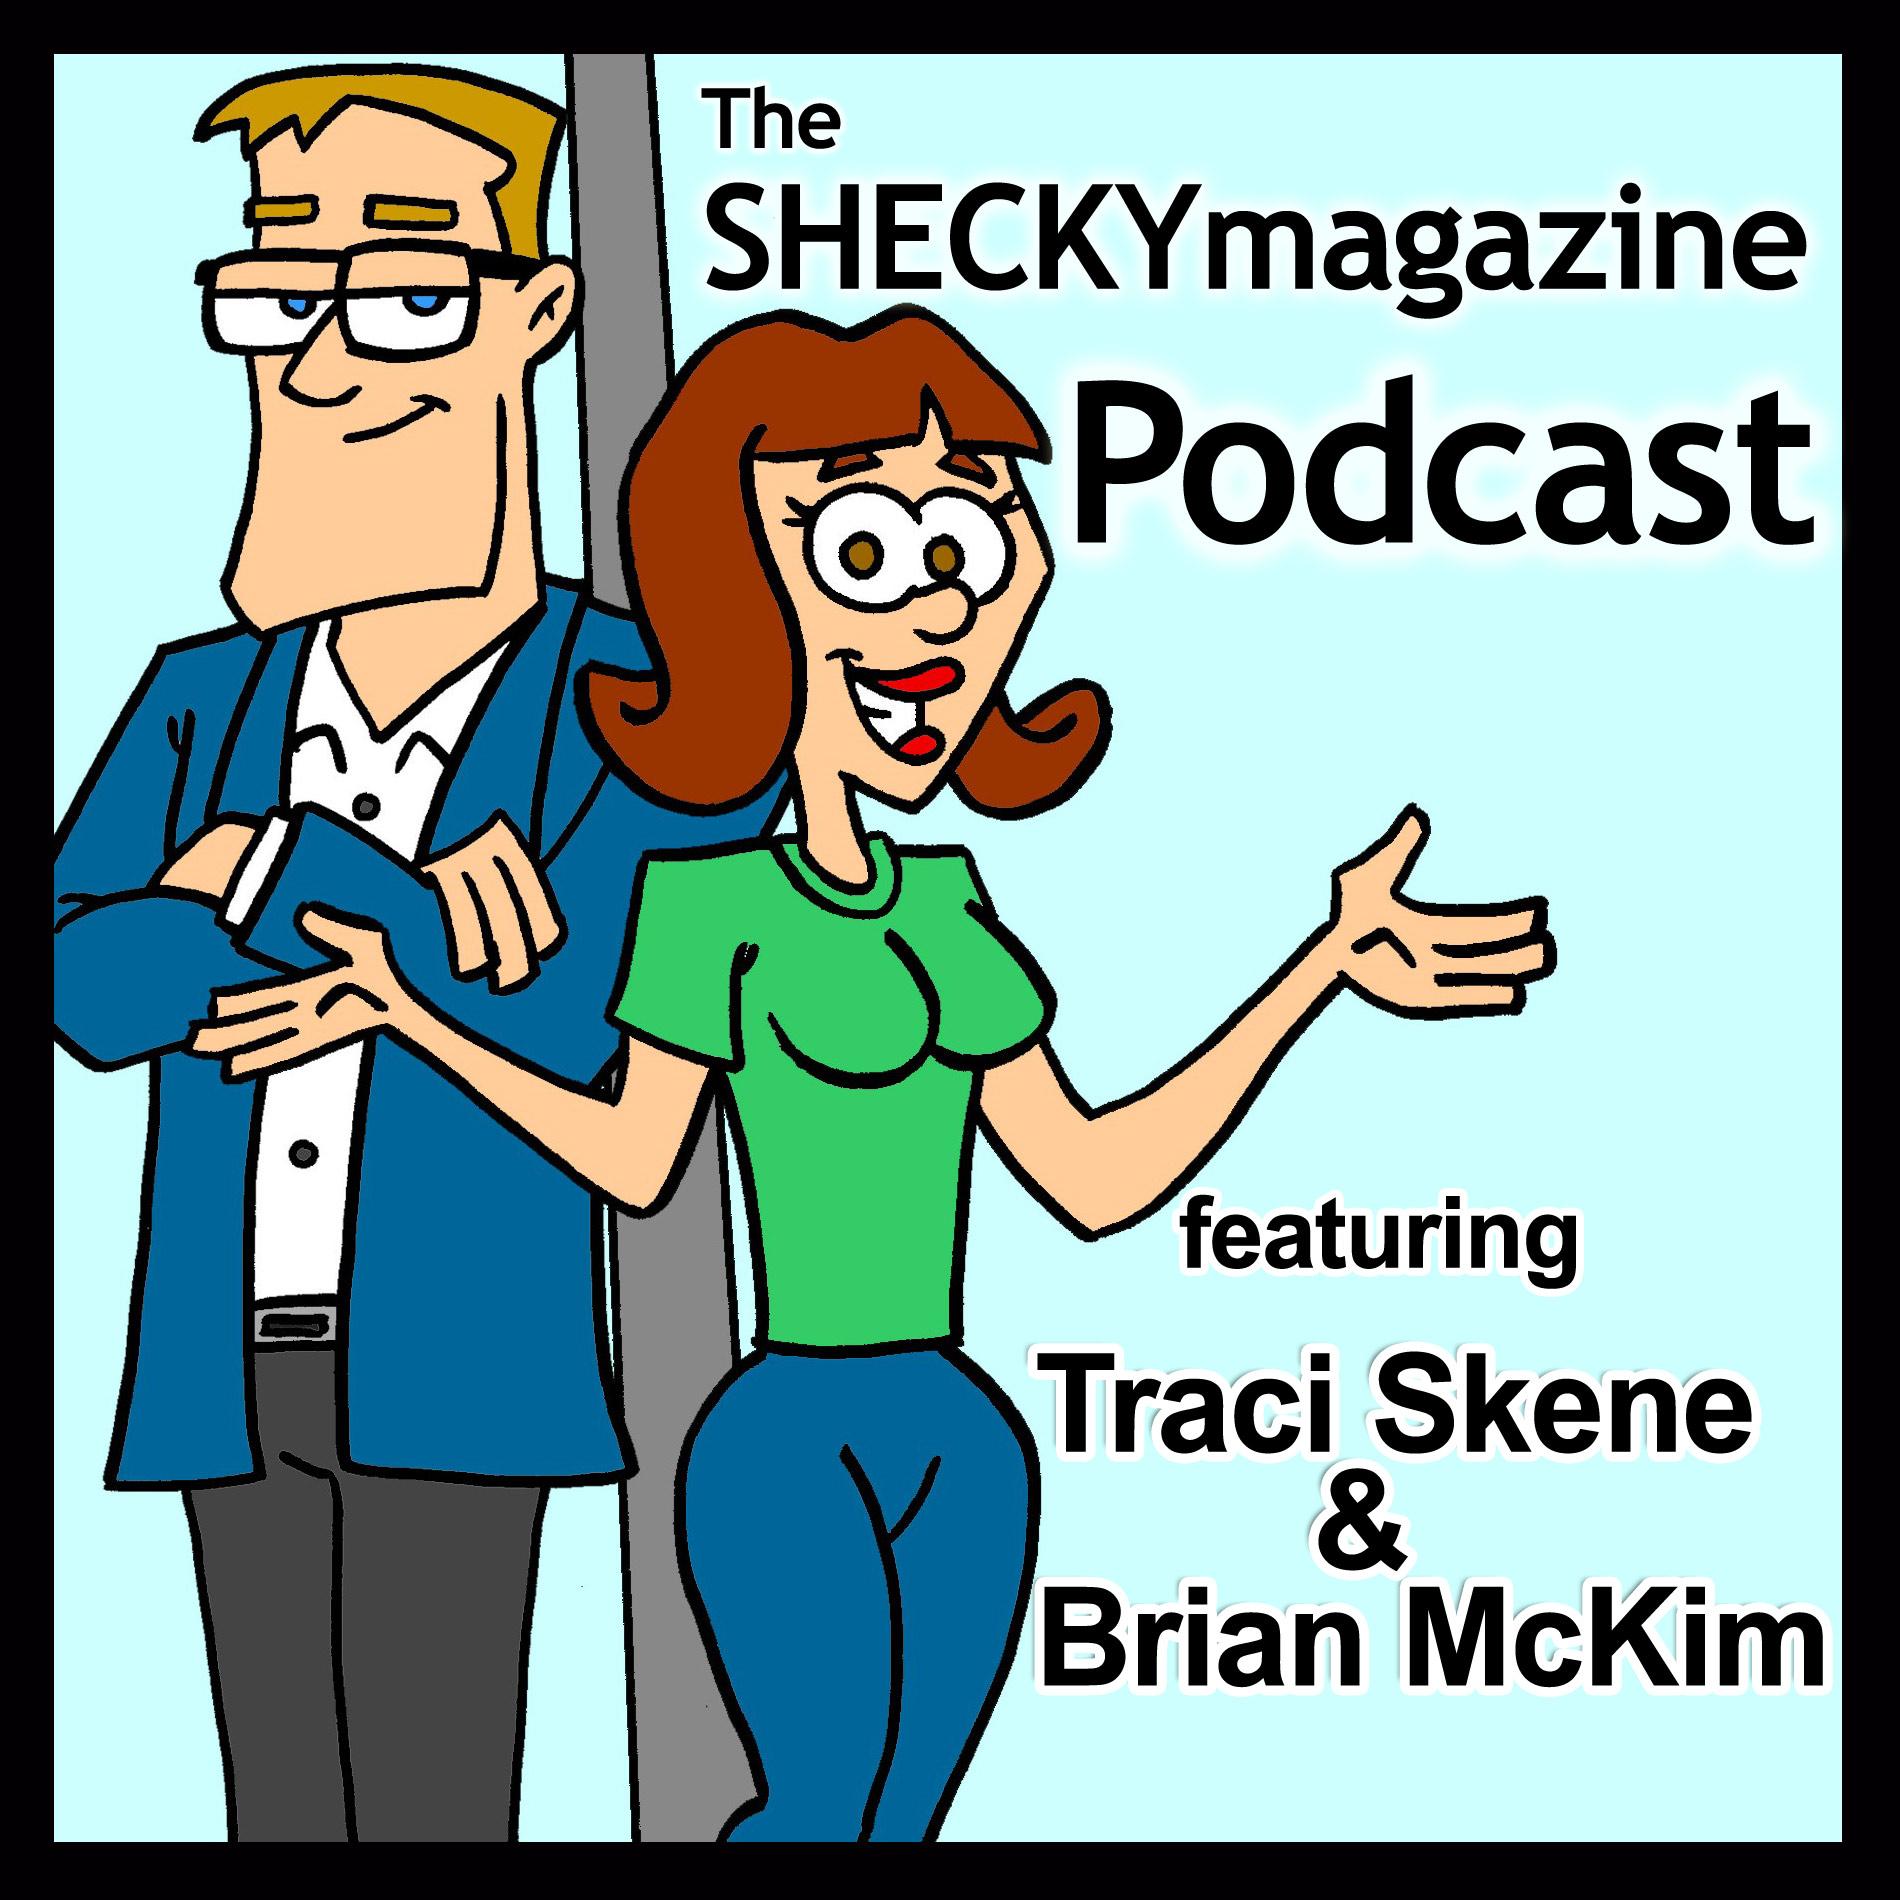 The SHECKYmagazine Podcast show art